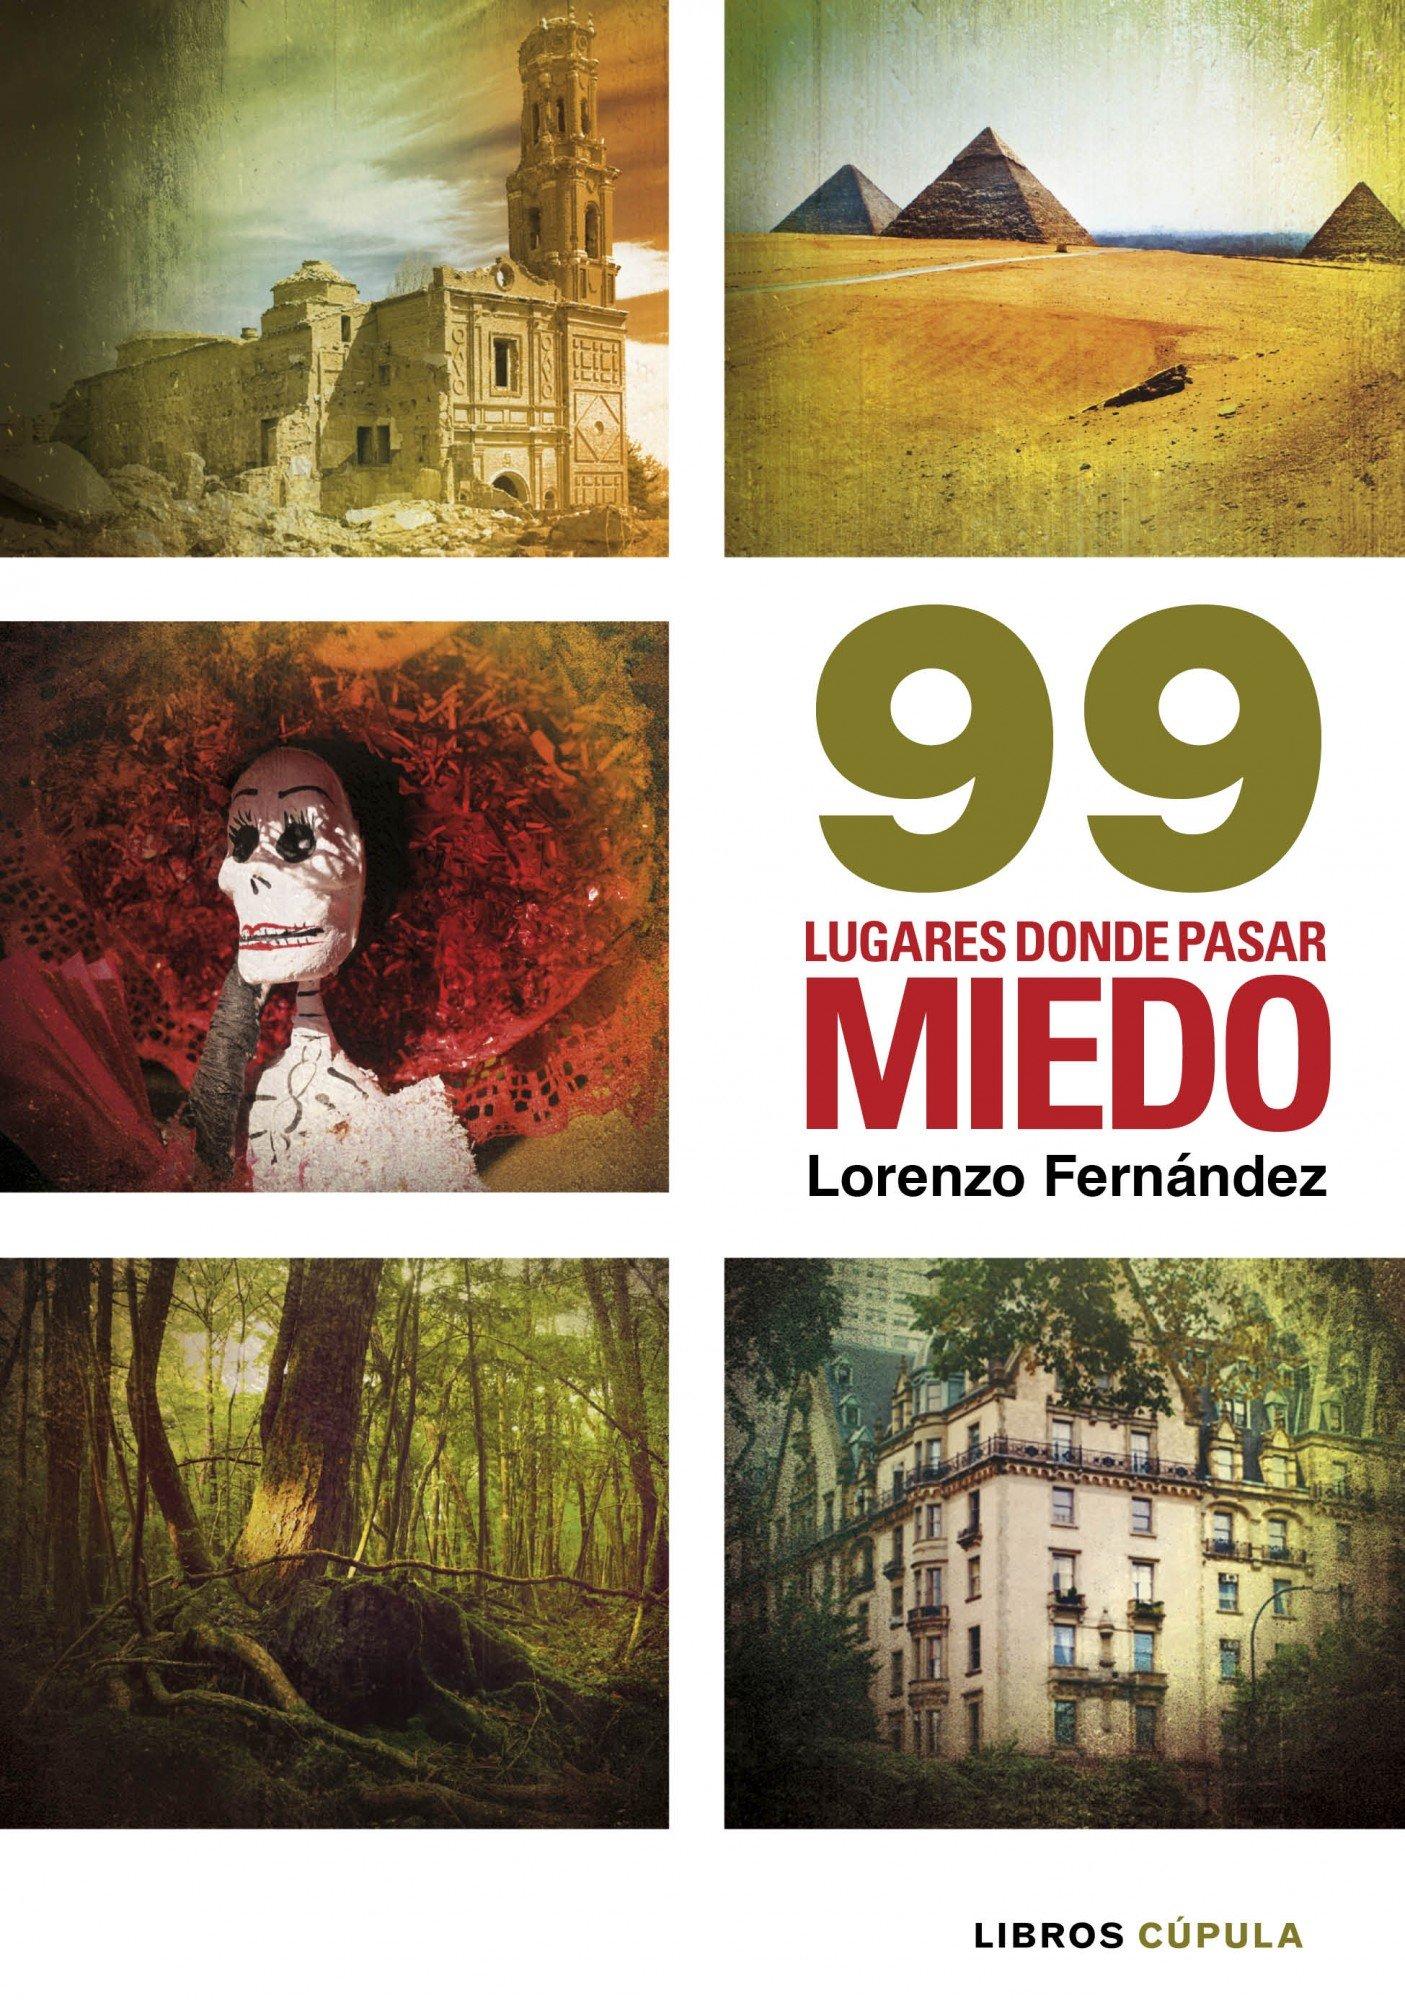 99 lugares donde pasar miedo (Hobbies): Amazon.es: Fernández Bueno, Lorenzo: Libros